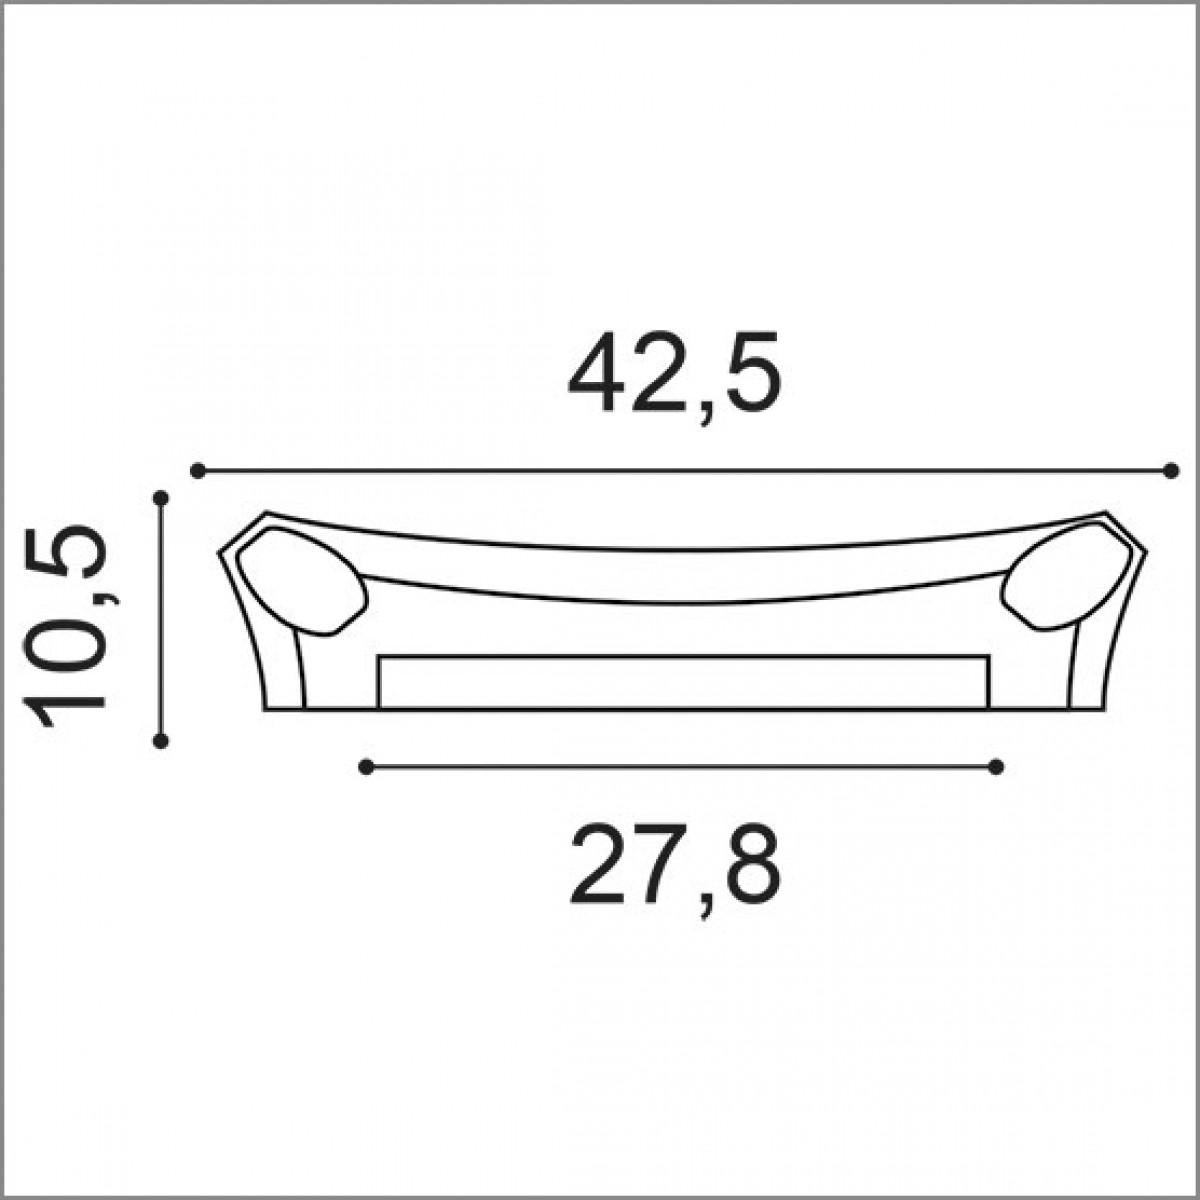 Capitel Luxxus K251, Dimensiuni: 10.5 X 35 X 42.5 cm, Orac Decor